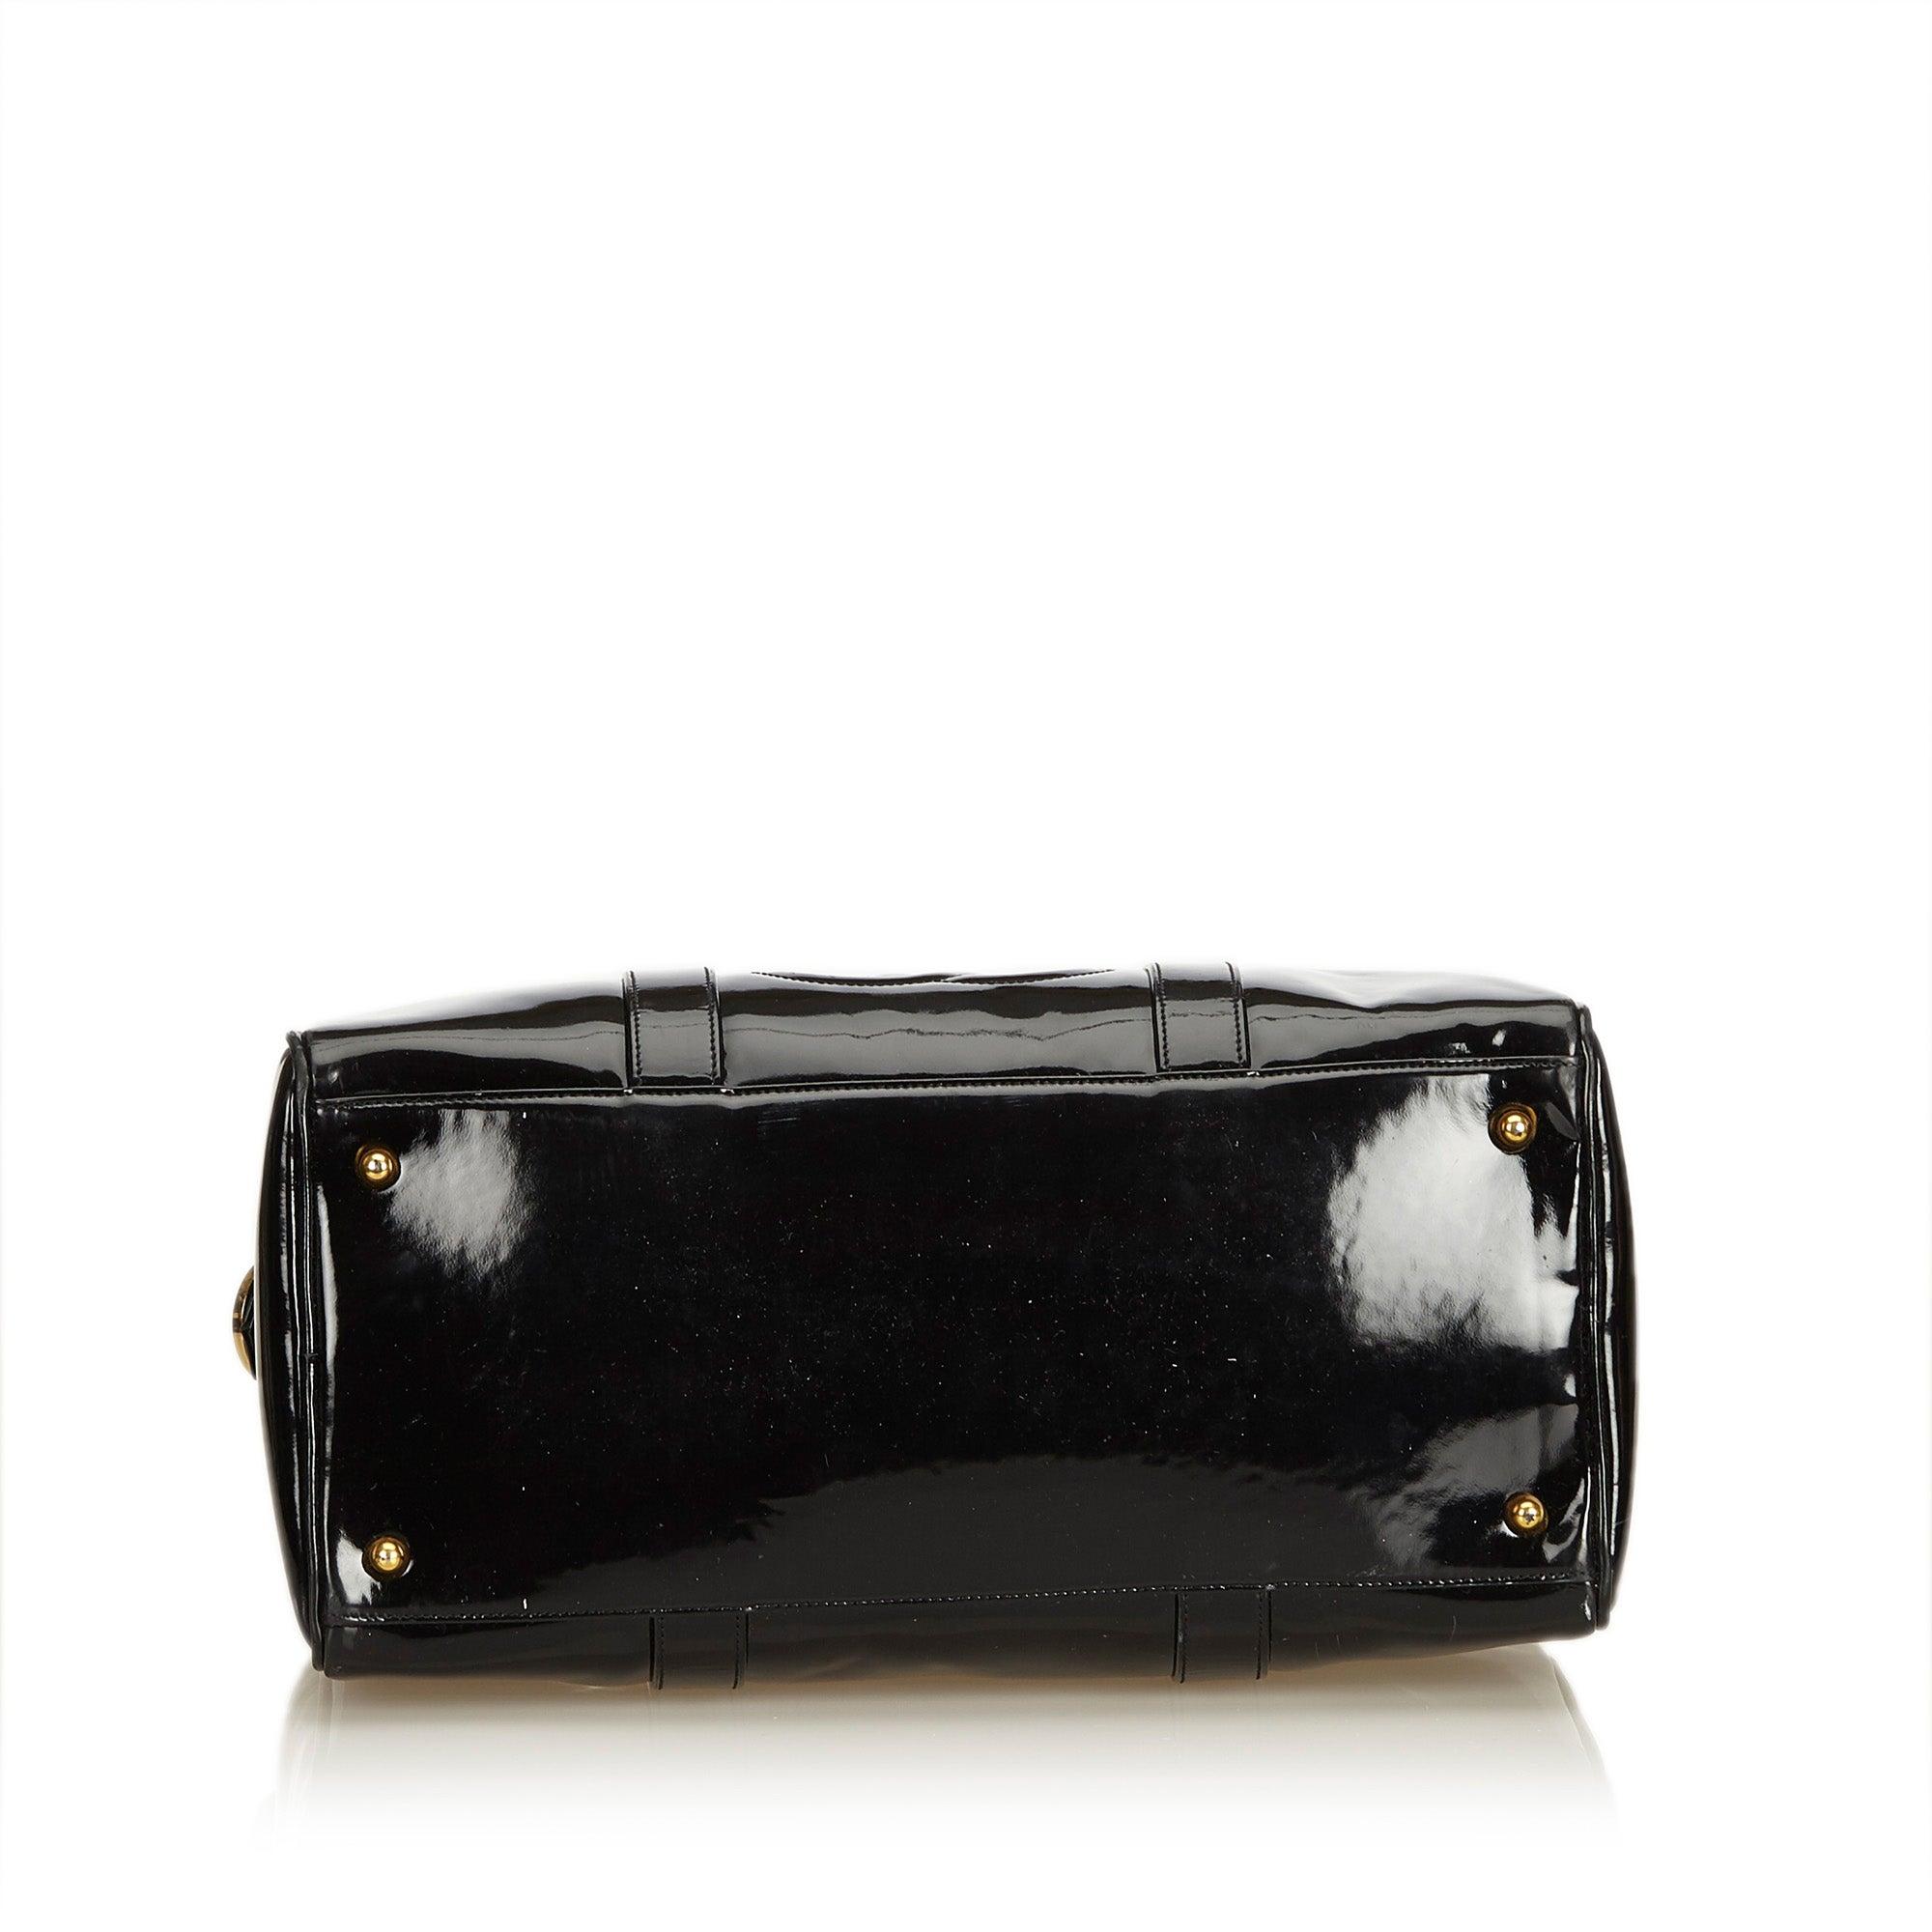 87a57a5274f90 Chanel Schwarzes Lackleder Boston Tasche bei 1stdibs